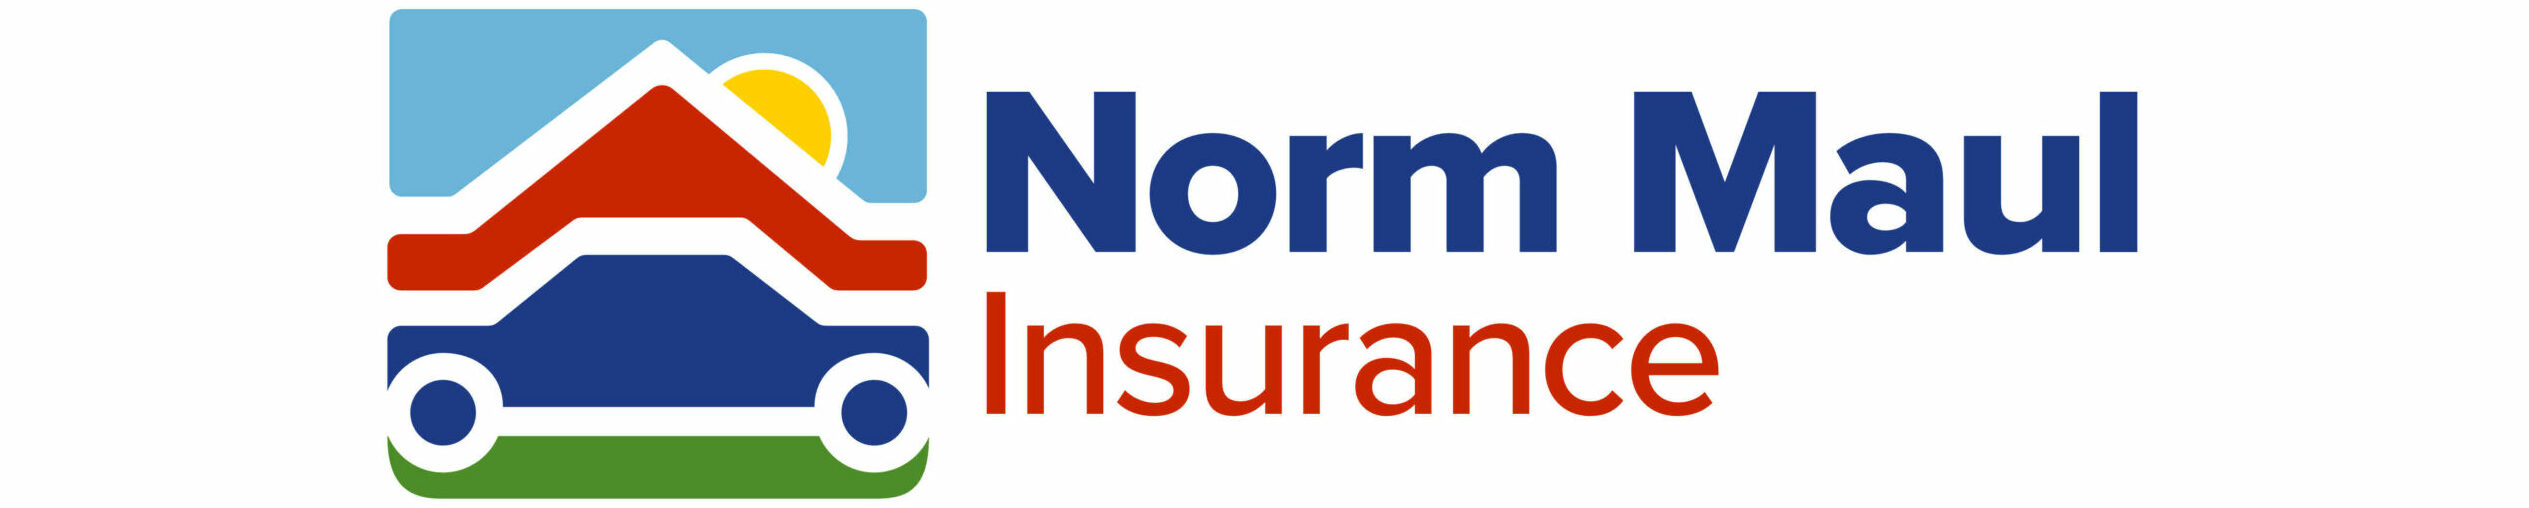 Norm Maul Insurance